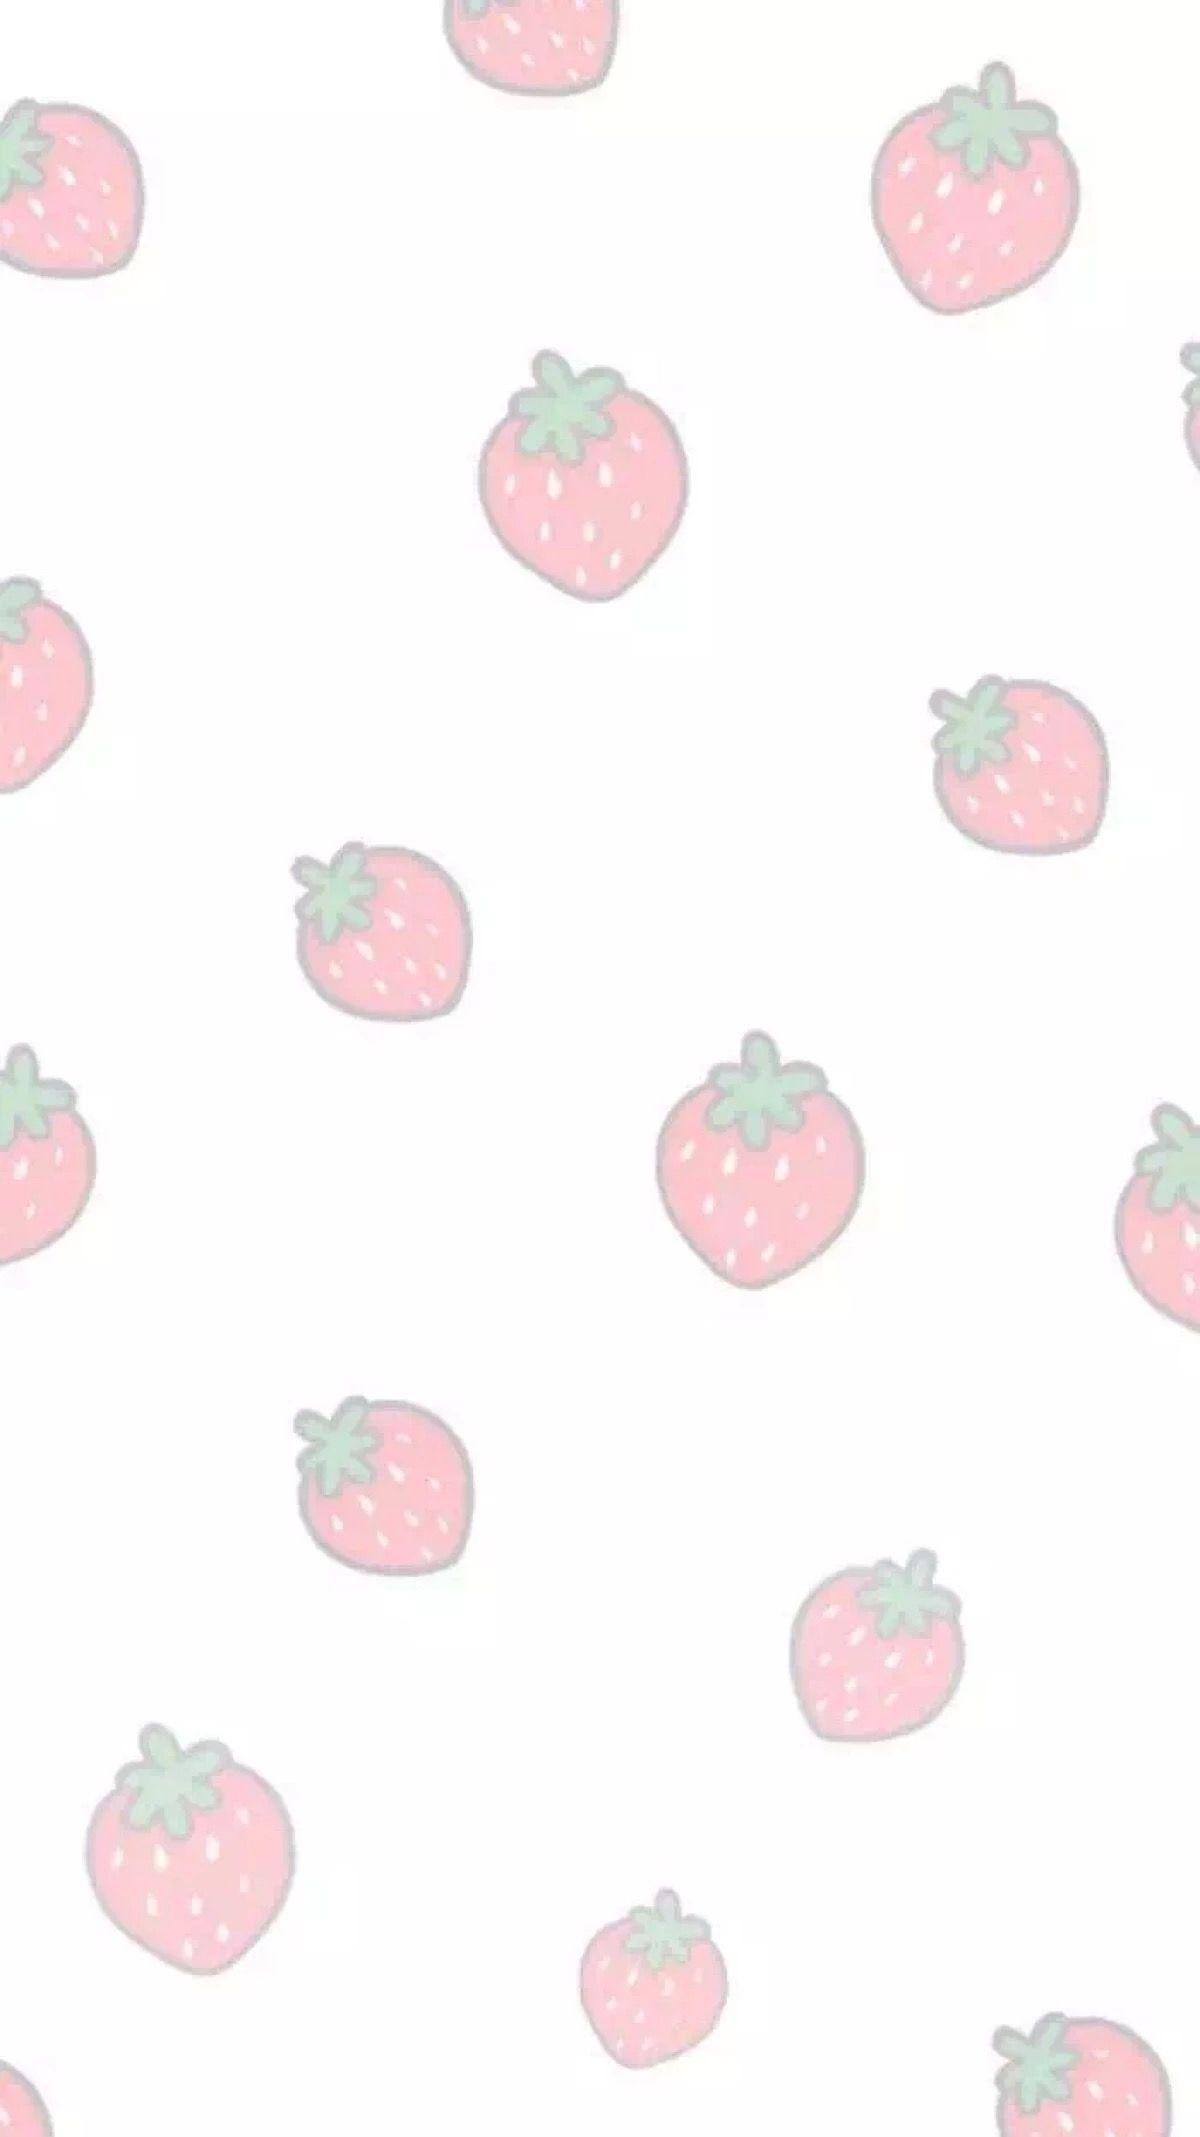 ︎∣ᴮᵞᵛᴵ·⁴·ᵞᴼᵁ∣ ︎ (With images)   Wallpaper size, Windows phone